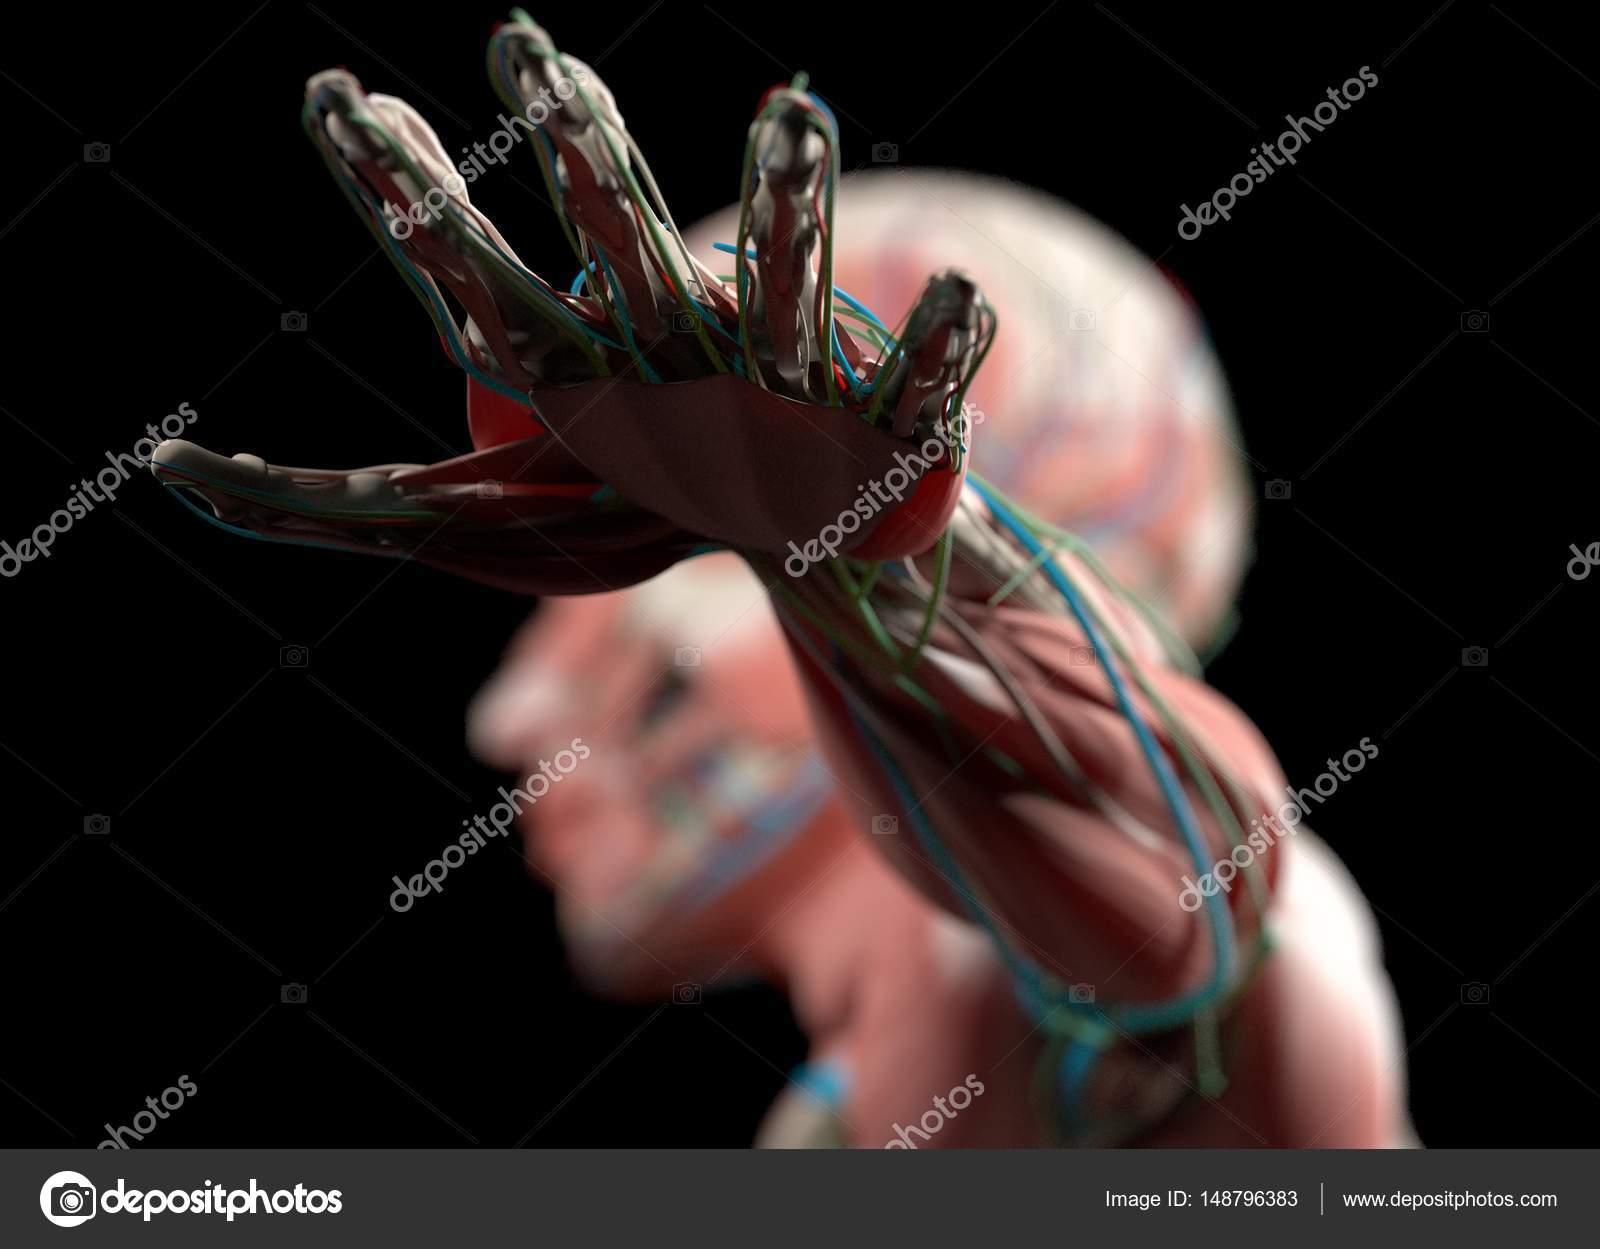 menschliche Anatomie Handmodell — Stockfoto © AnatomyInsider #148796383